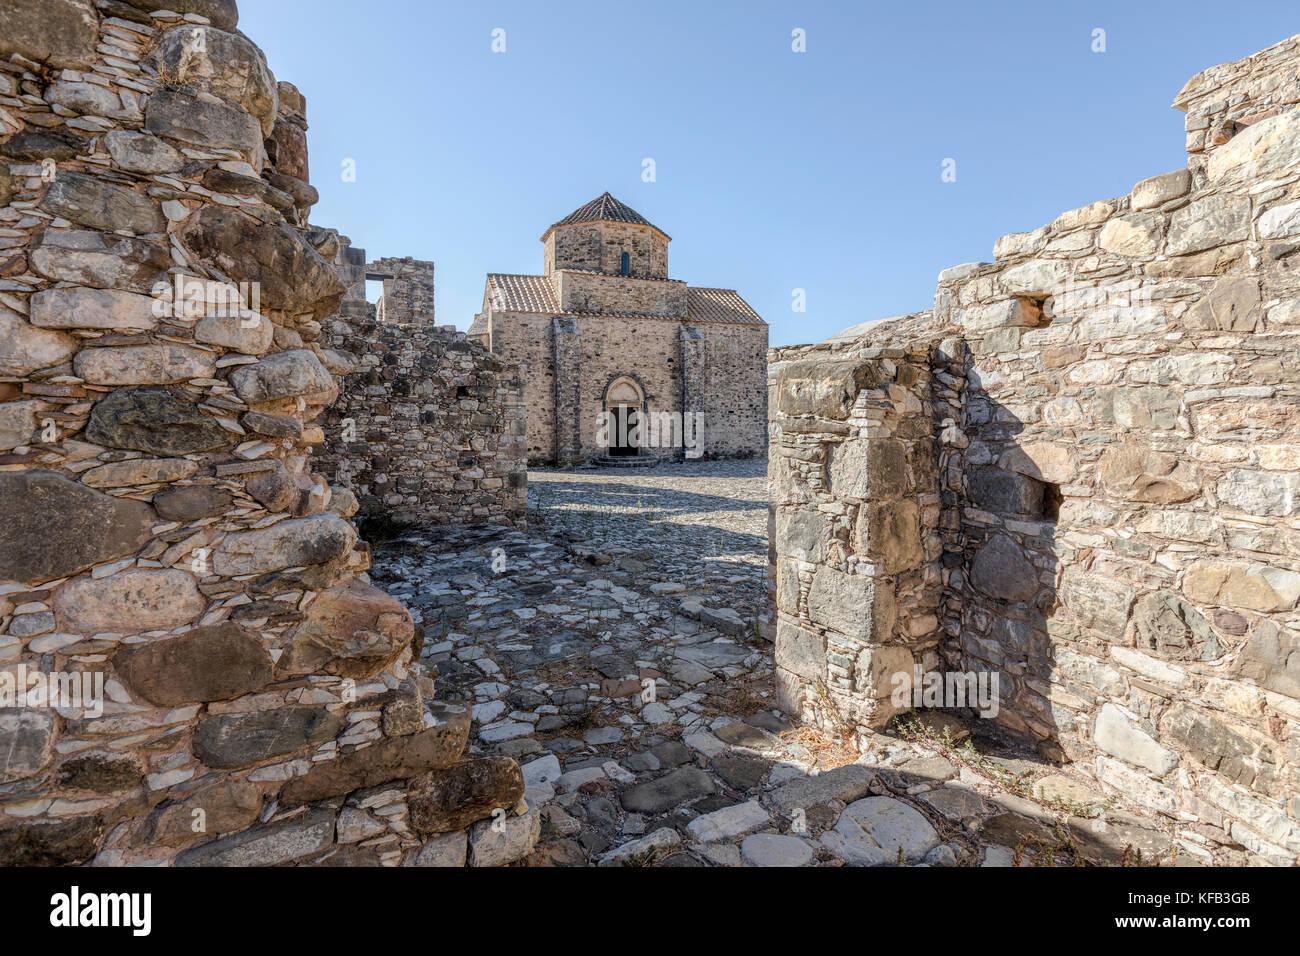 Panagia tou Sinti Monastery, Paphos, Cyprus - Stock Image